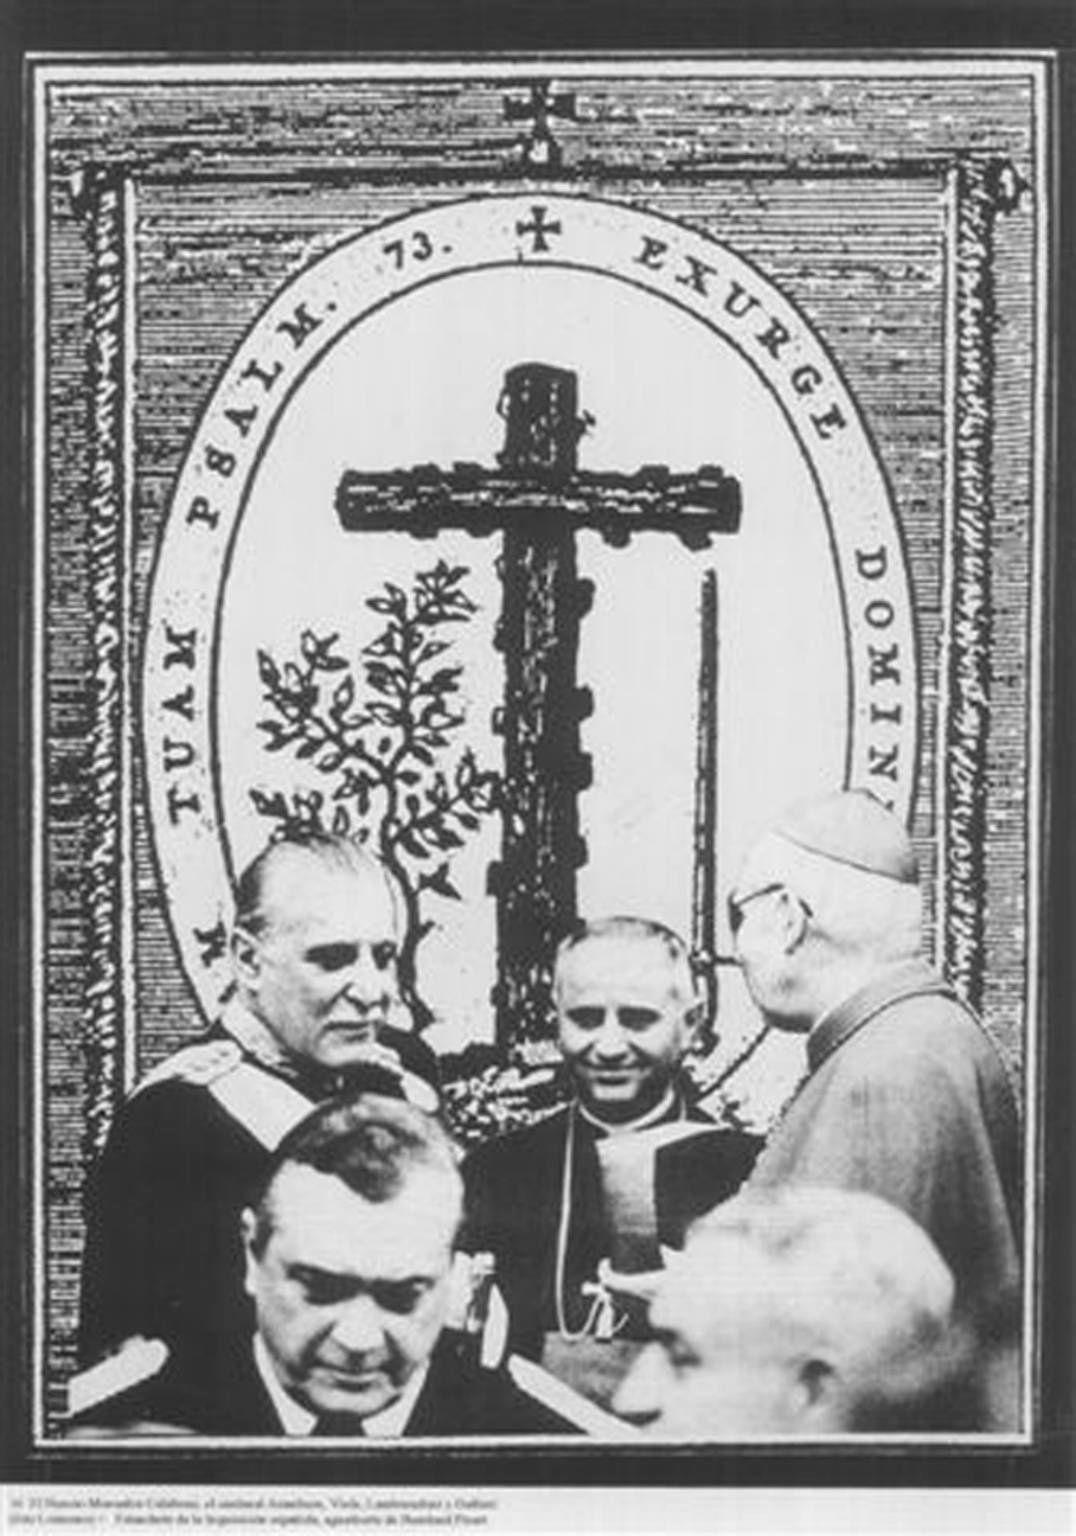 Nuncio Monsignor Calabresi, Cardinal Aramburu, Viola, Lambruschini and Galtieri (Photo: Loiácono) + 'Banner of the Spanish Inquisition',